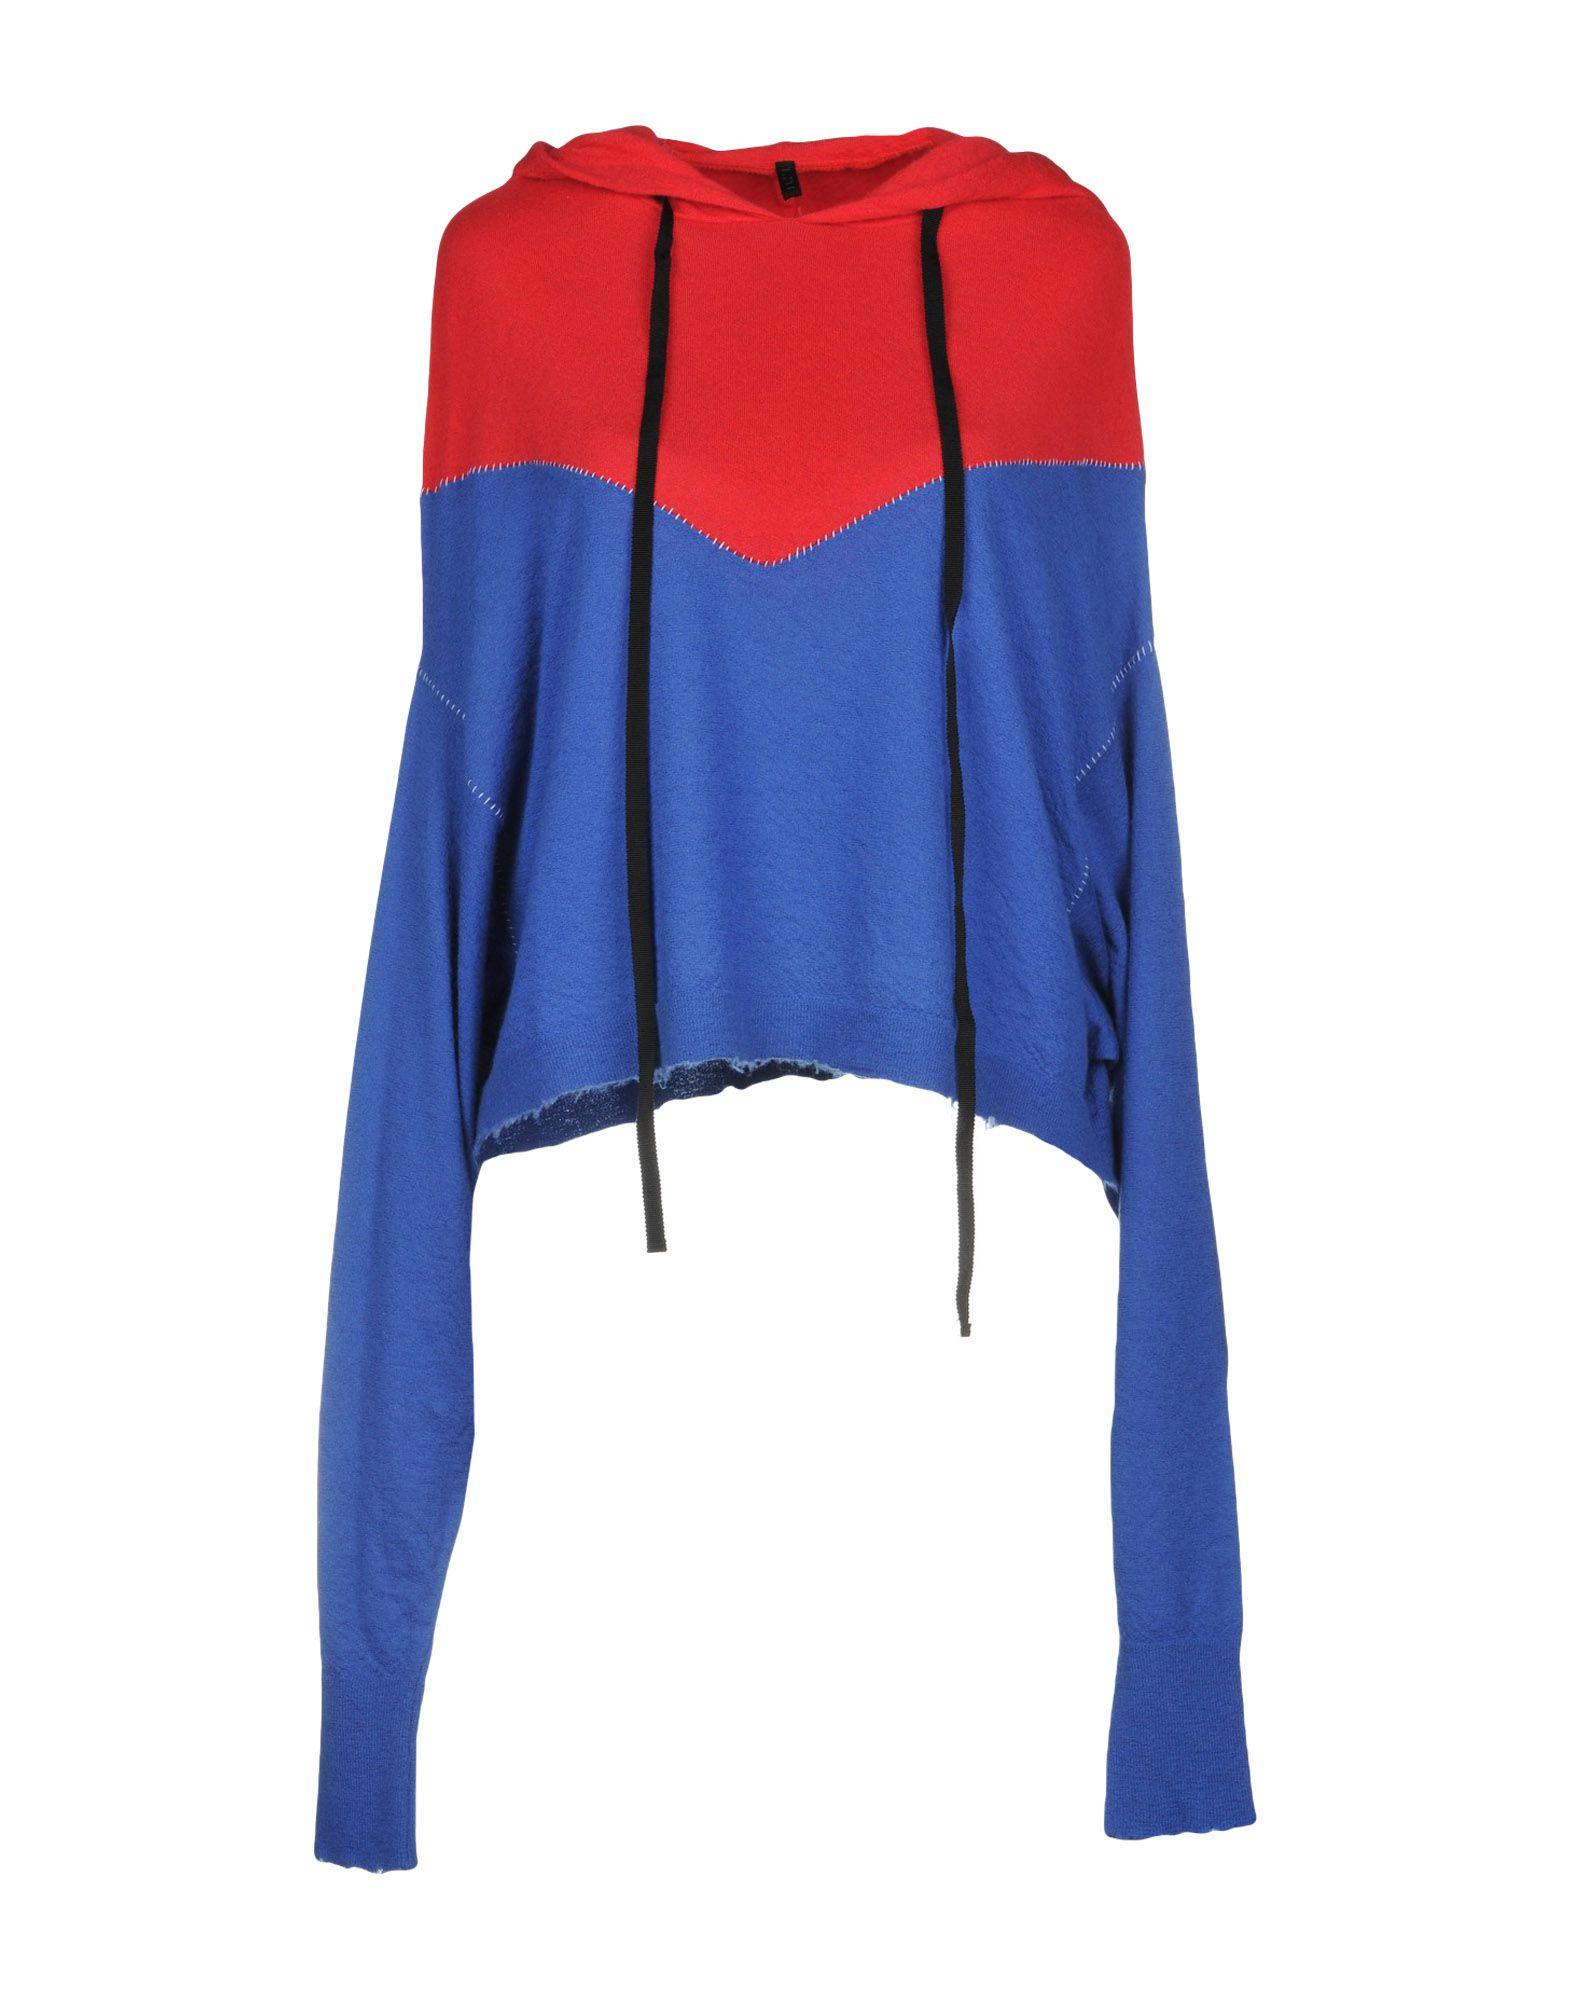 BEN TAVERNITI™ UNRAVEL PROJECT Свитер ben taverniti™ unravel project свитер